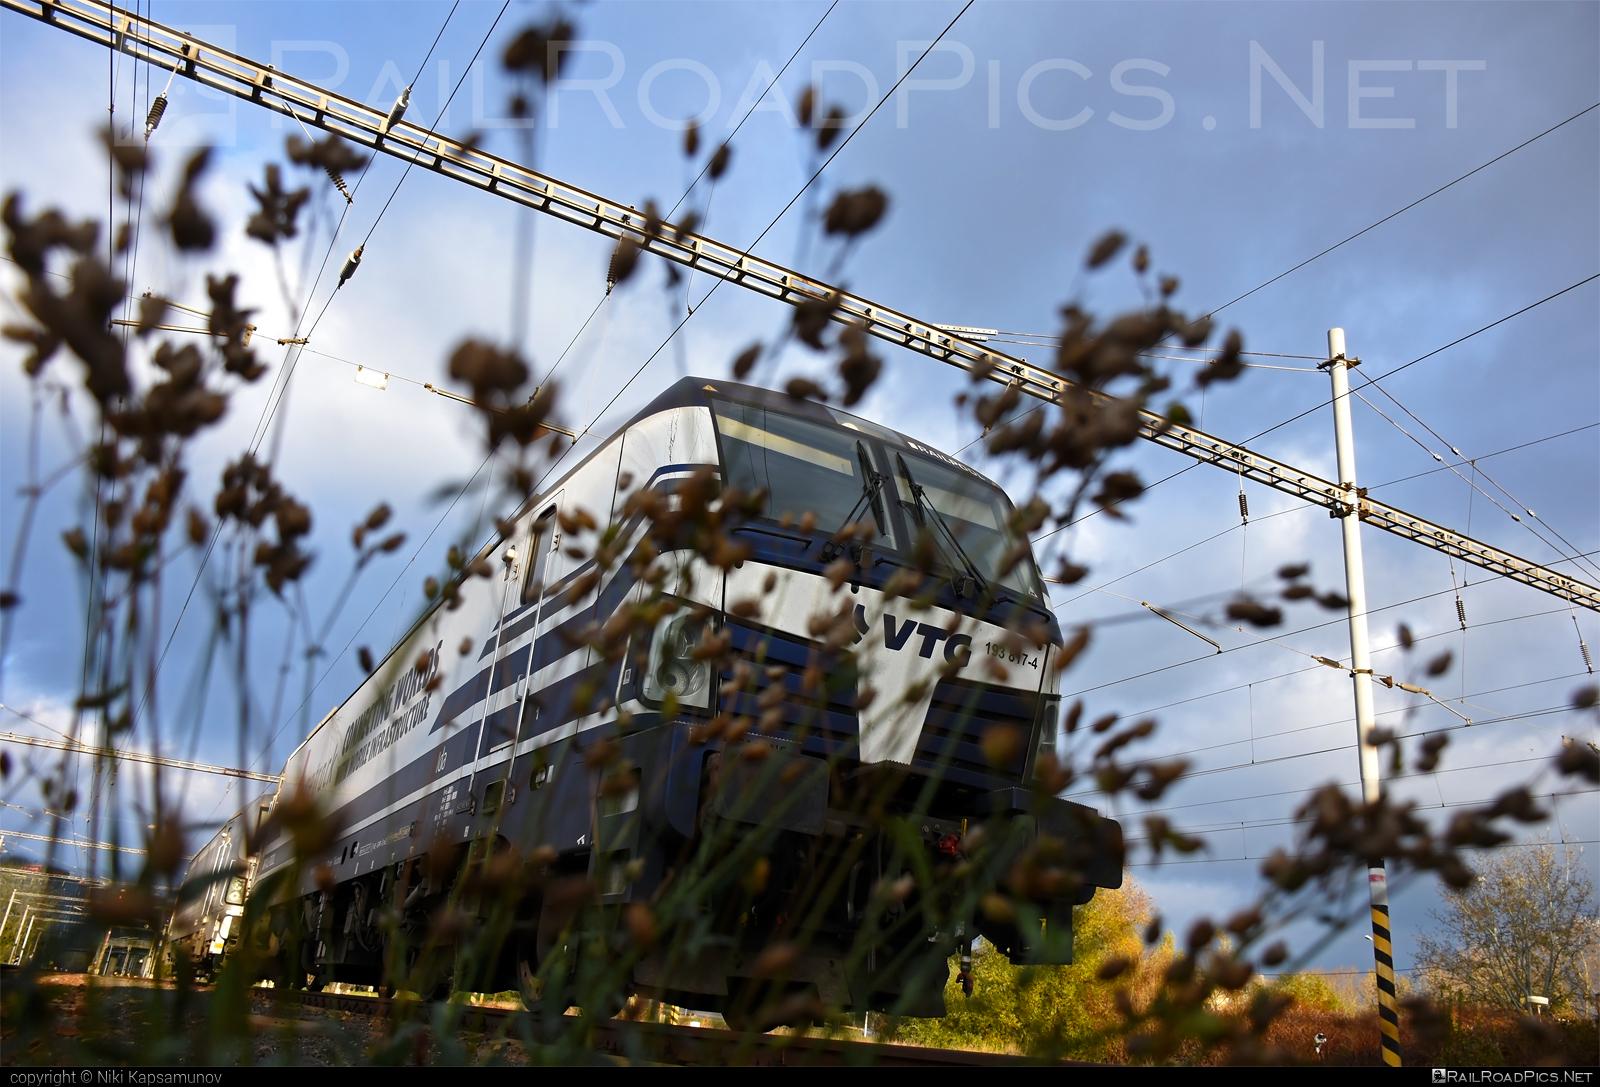 Siemens Vectron AC - 193 817-4 operated by Retrack Slovakia s. r. o. #railpool #railpoolgmbh #retrack #retrackslovakia #siemens #siemensvectron #siemensvectronac #vectron #vectronac #vtg